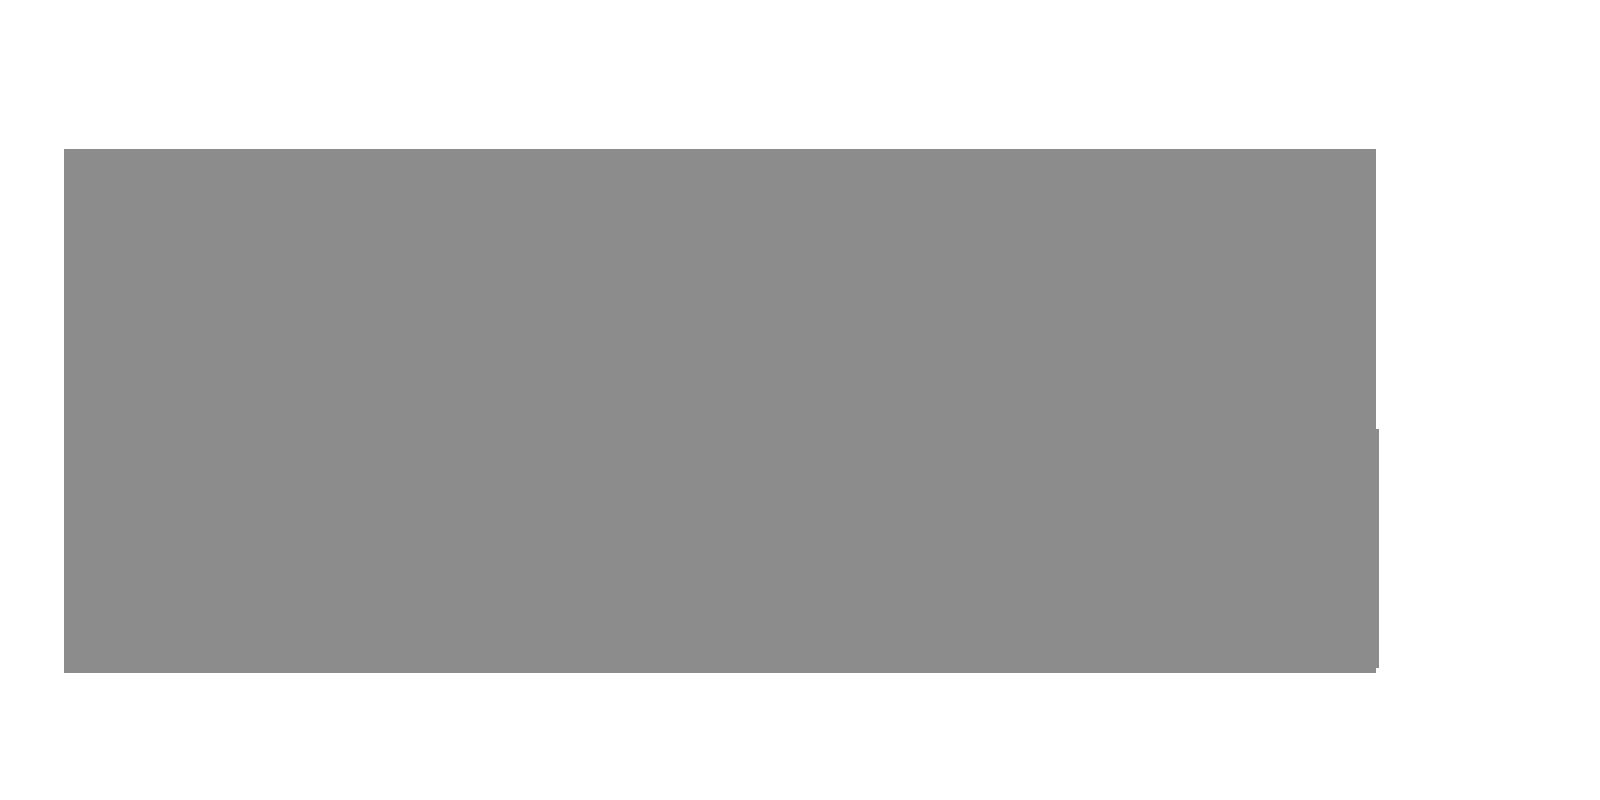 Patrik Westli